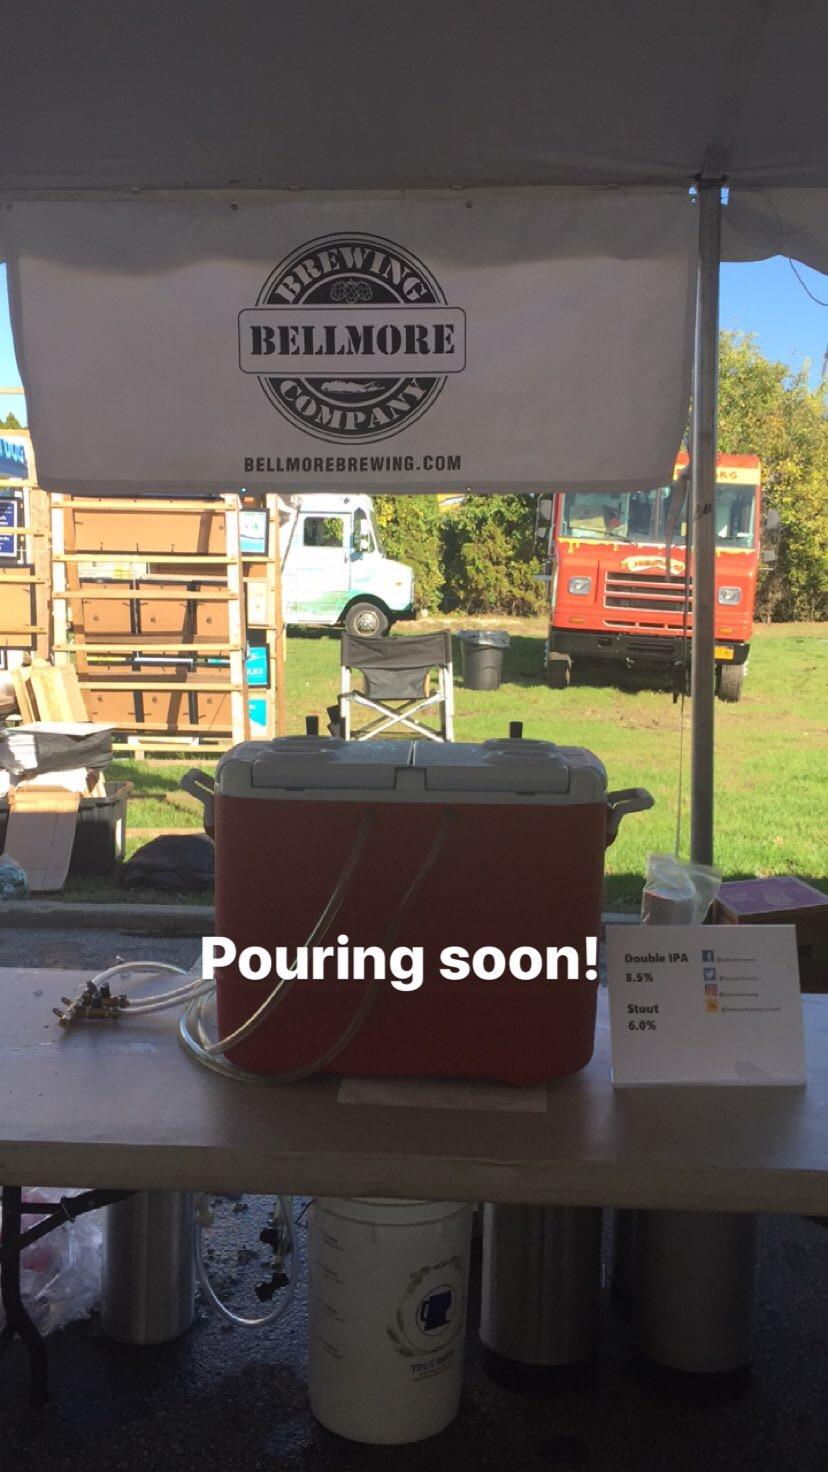 bellmore brewing punktoberfest 2017 booth setup.JPG